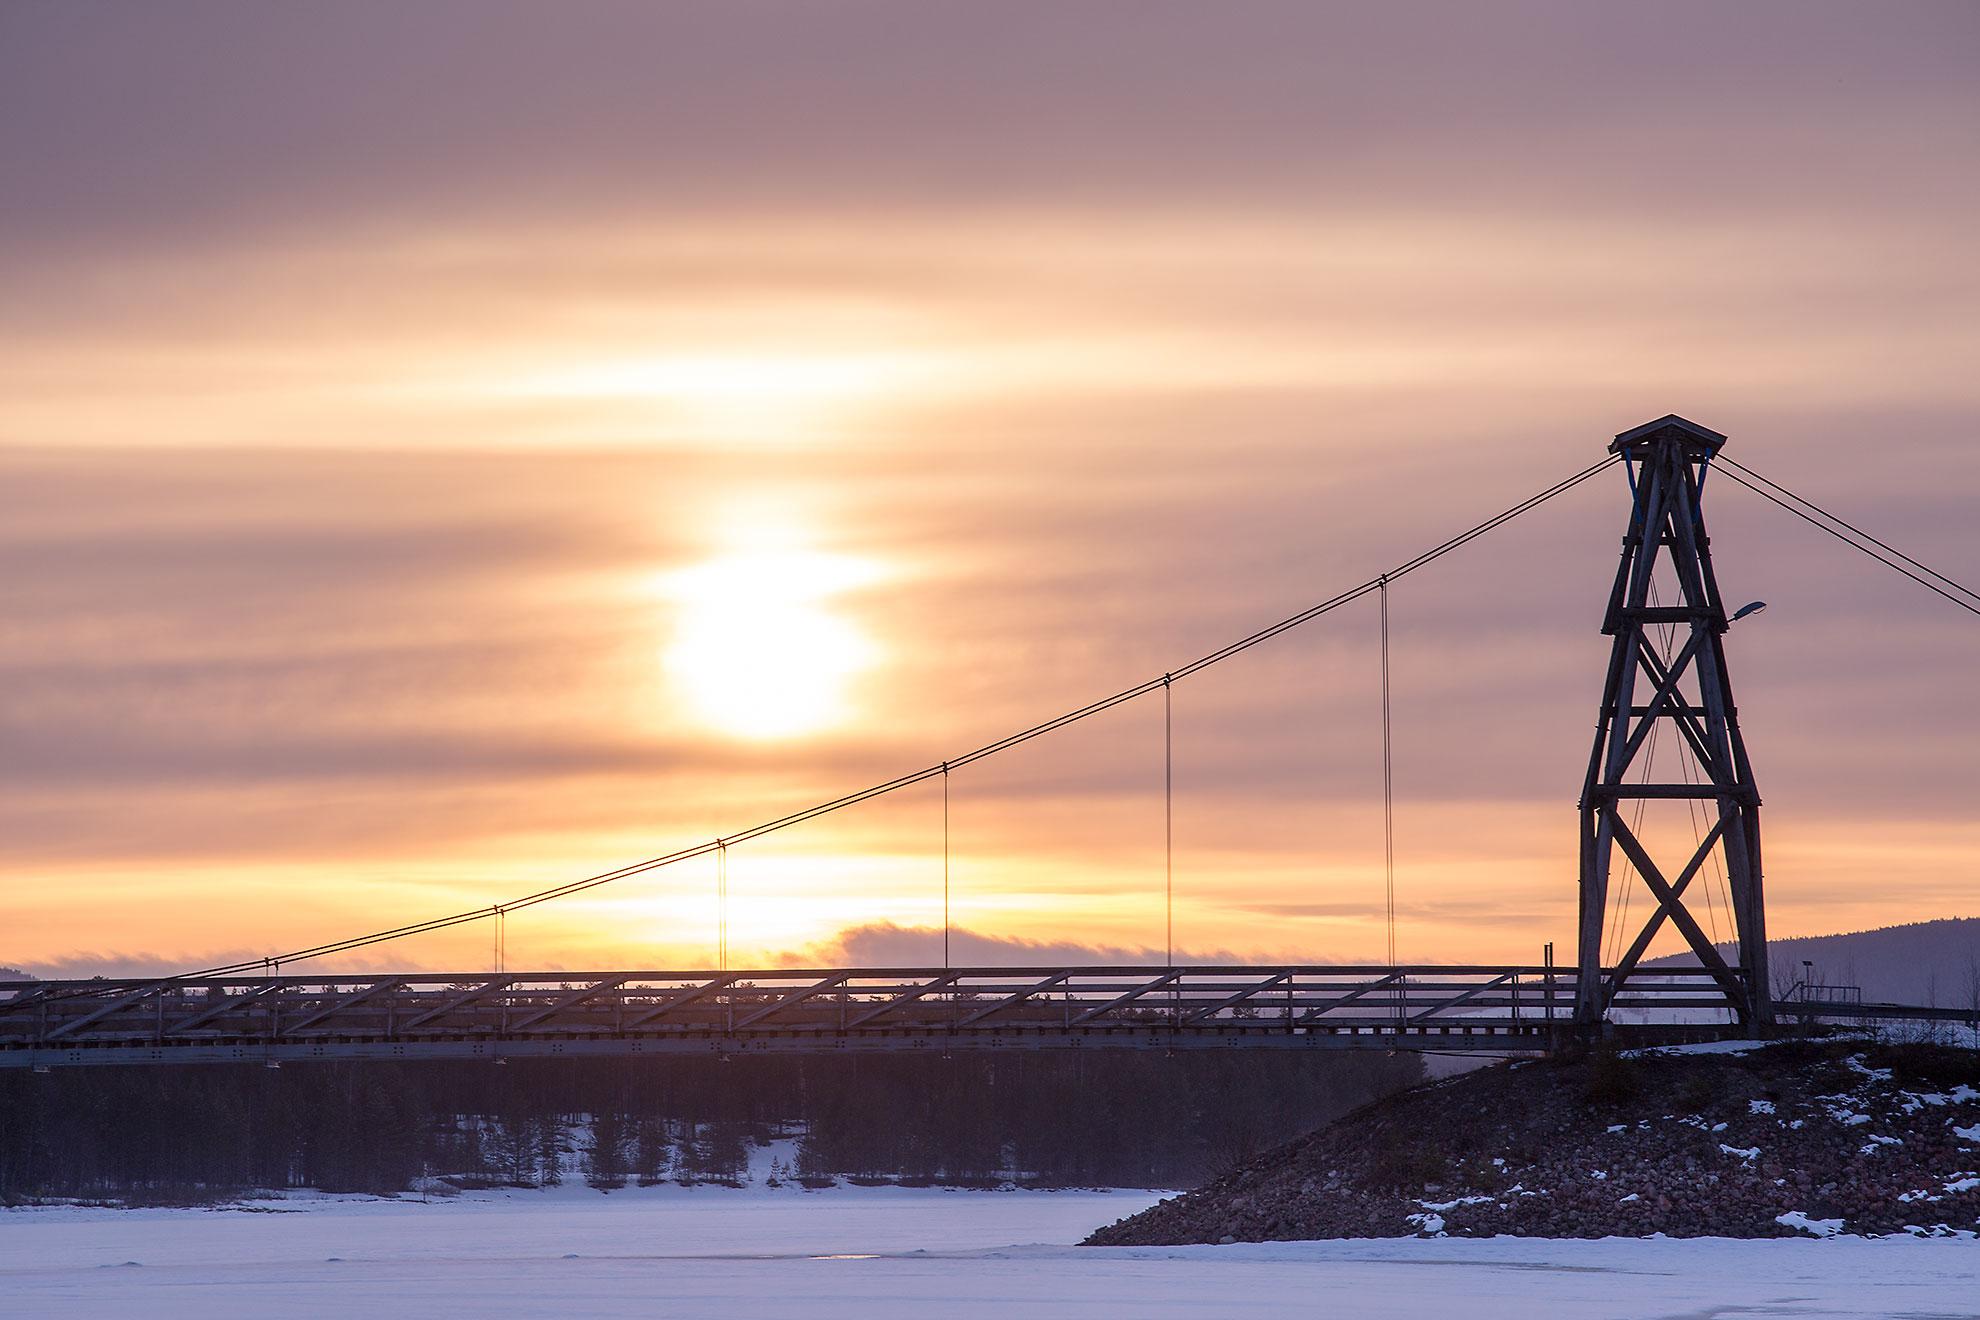 Solnedgång i Nordomsjön